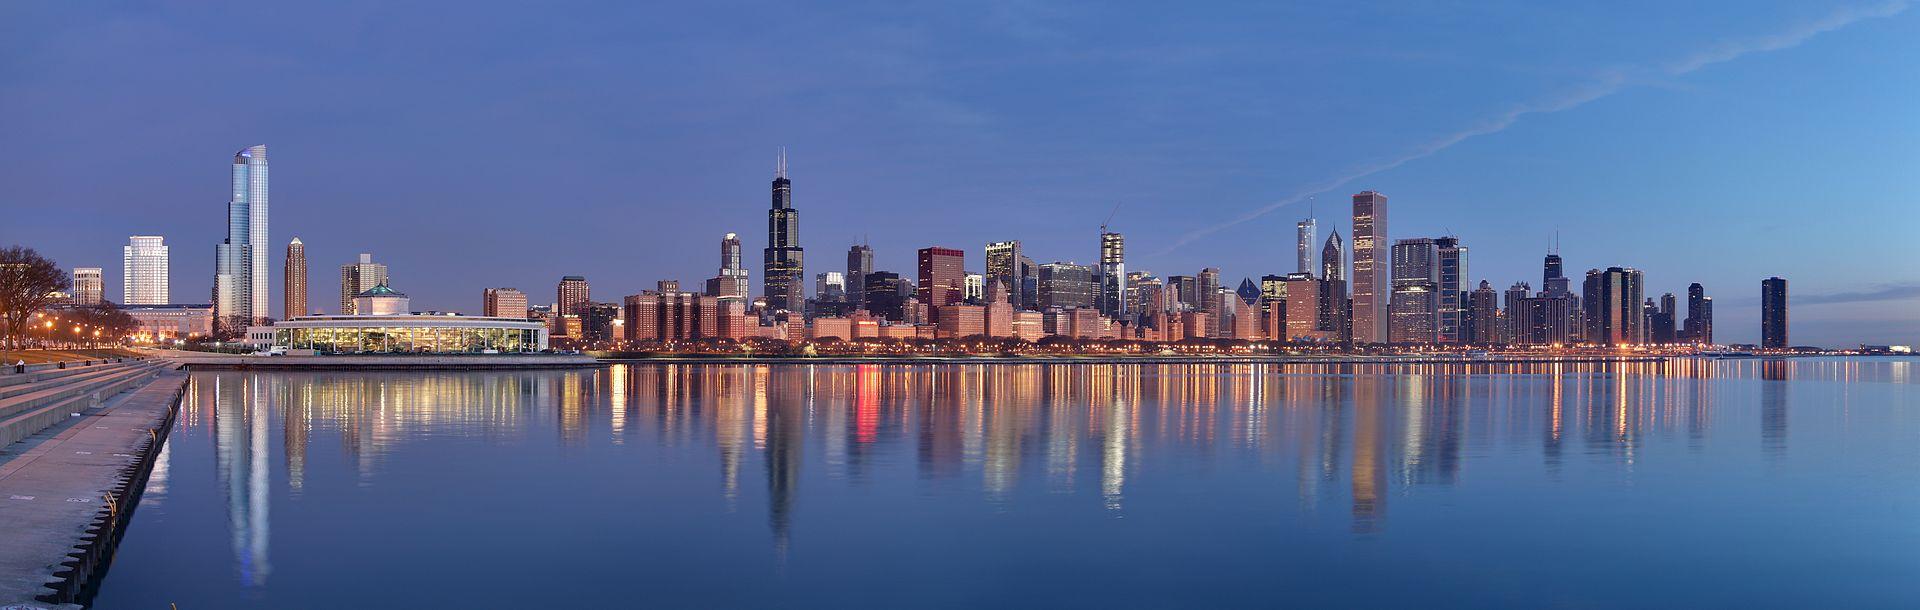 Chicago, Illinois (Daniel Schwen/Wikimedia Commons, Creative Commons)